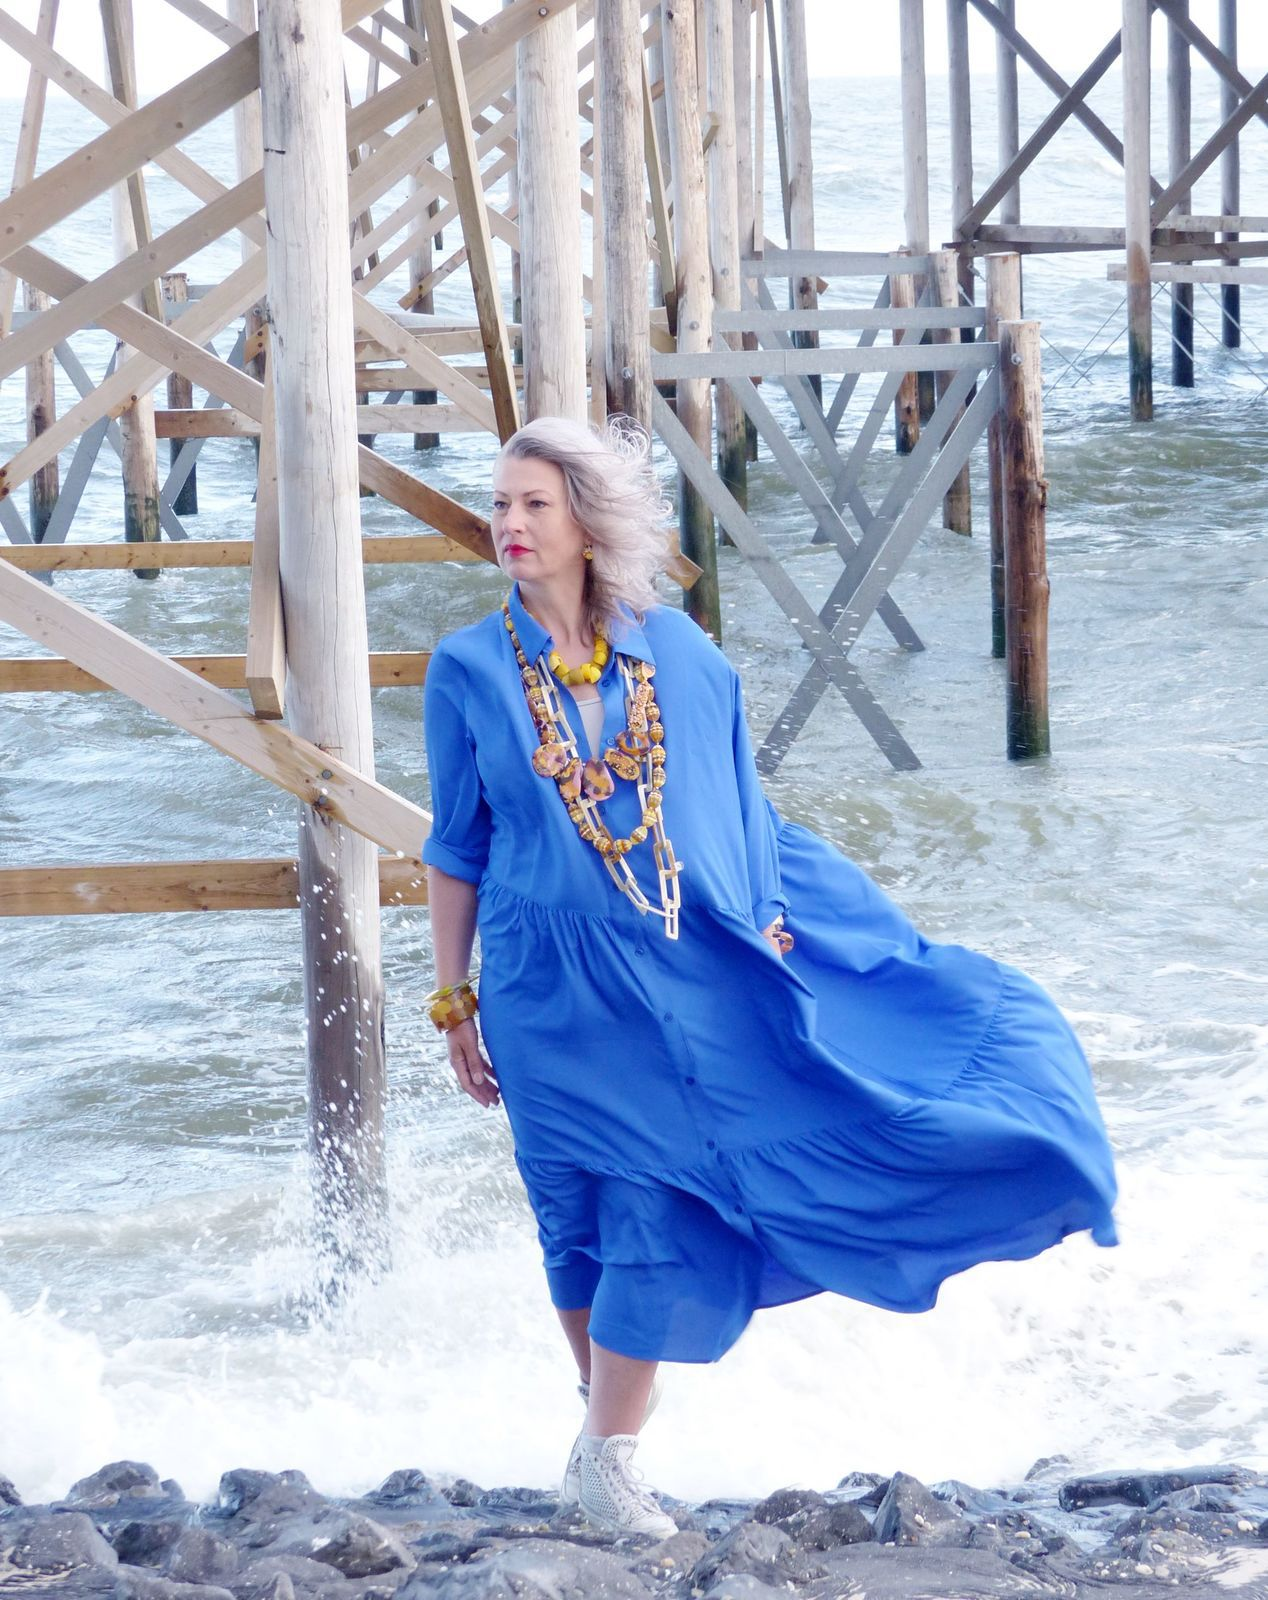 blaues kleid mit gelbem schmuck - edna mo